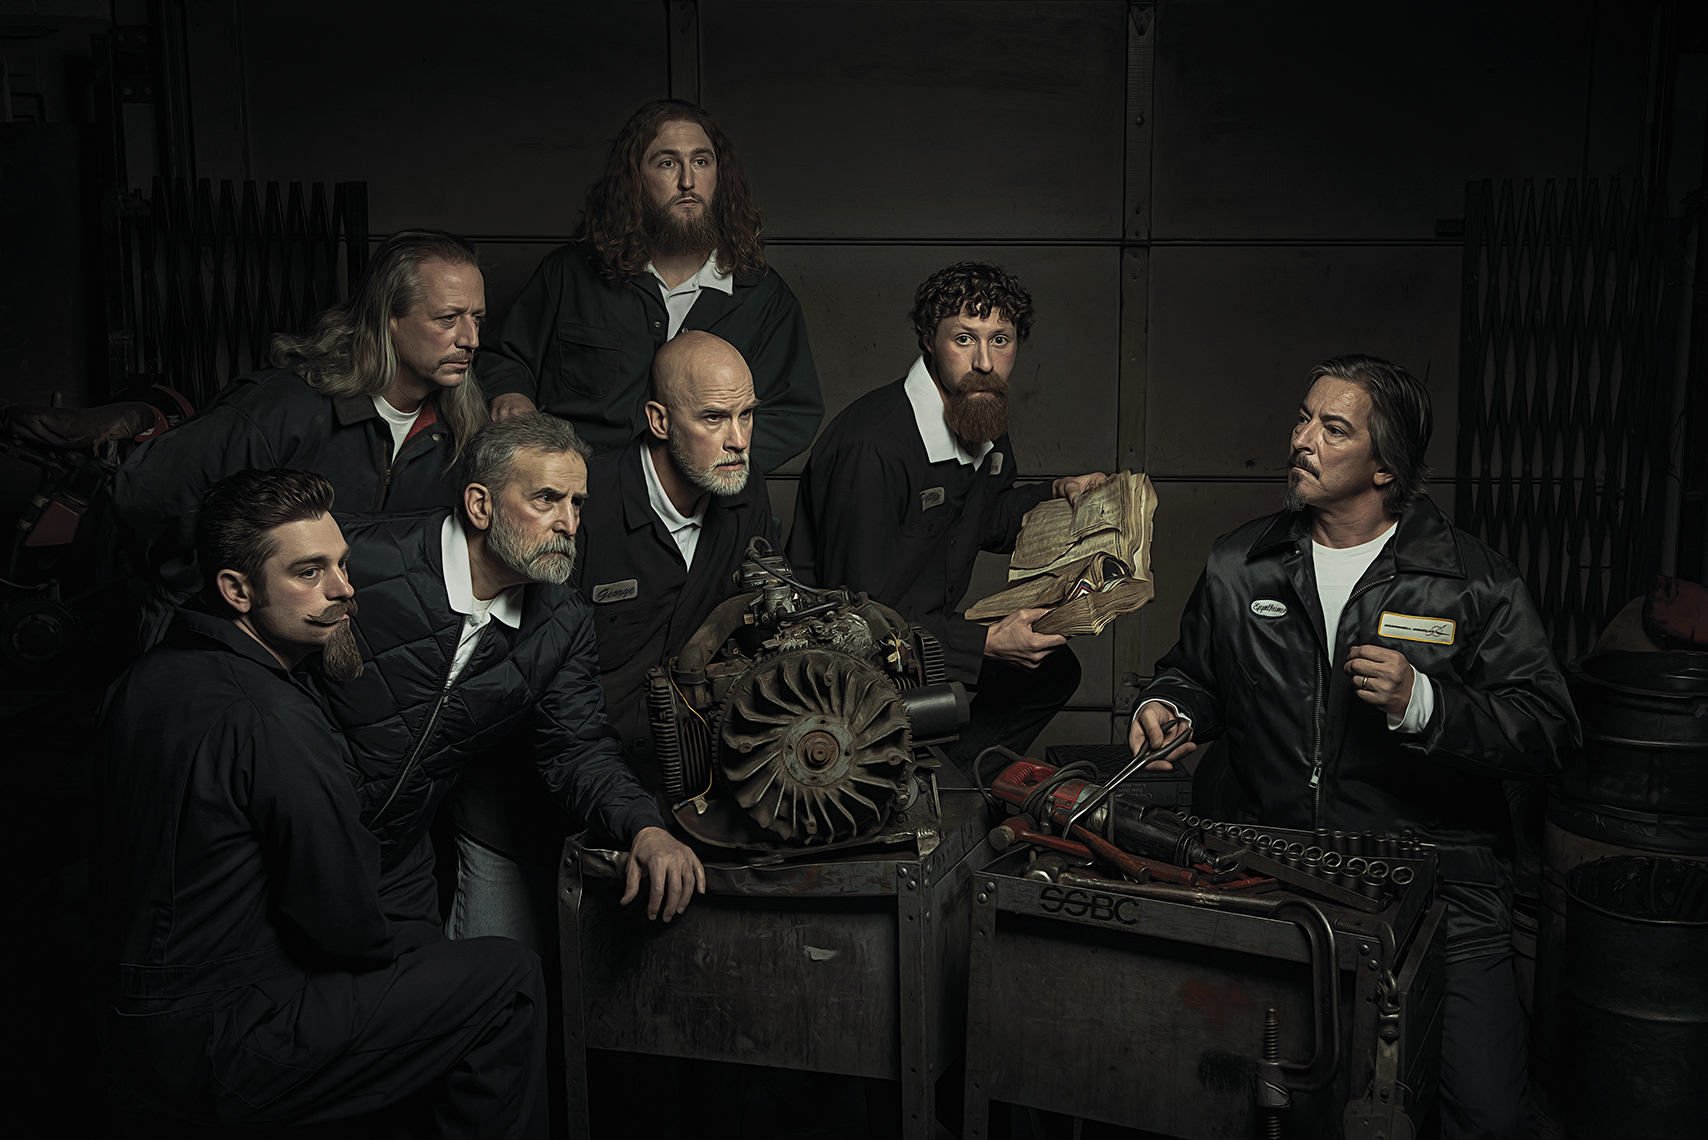 Renaissance Series - The Anatomy Lesson Fine art photograph